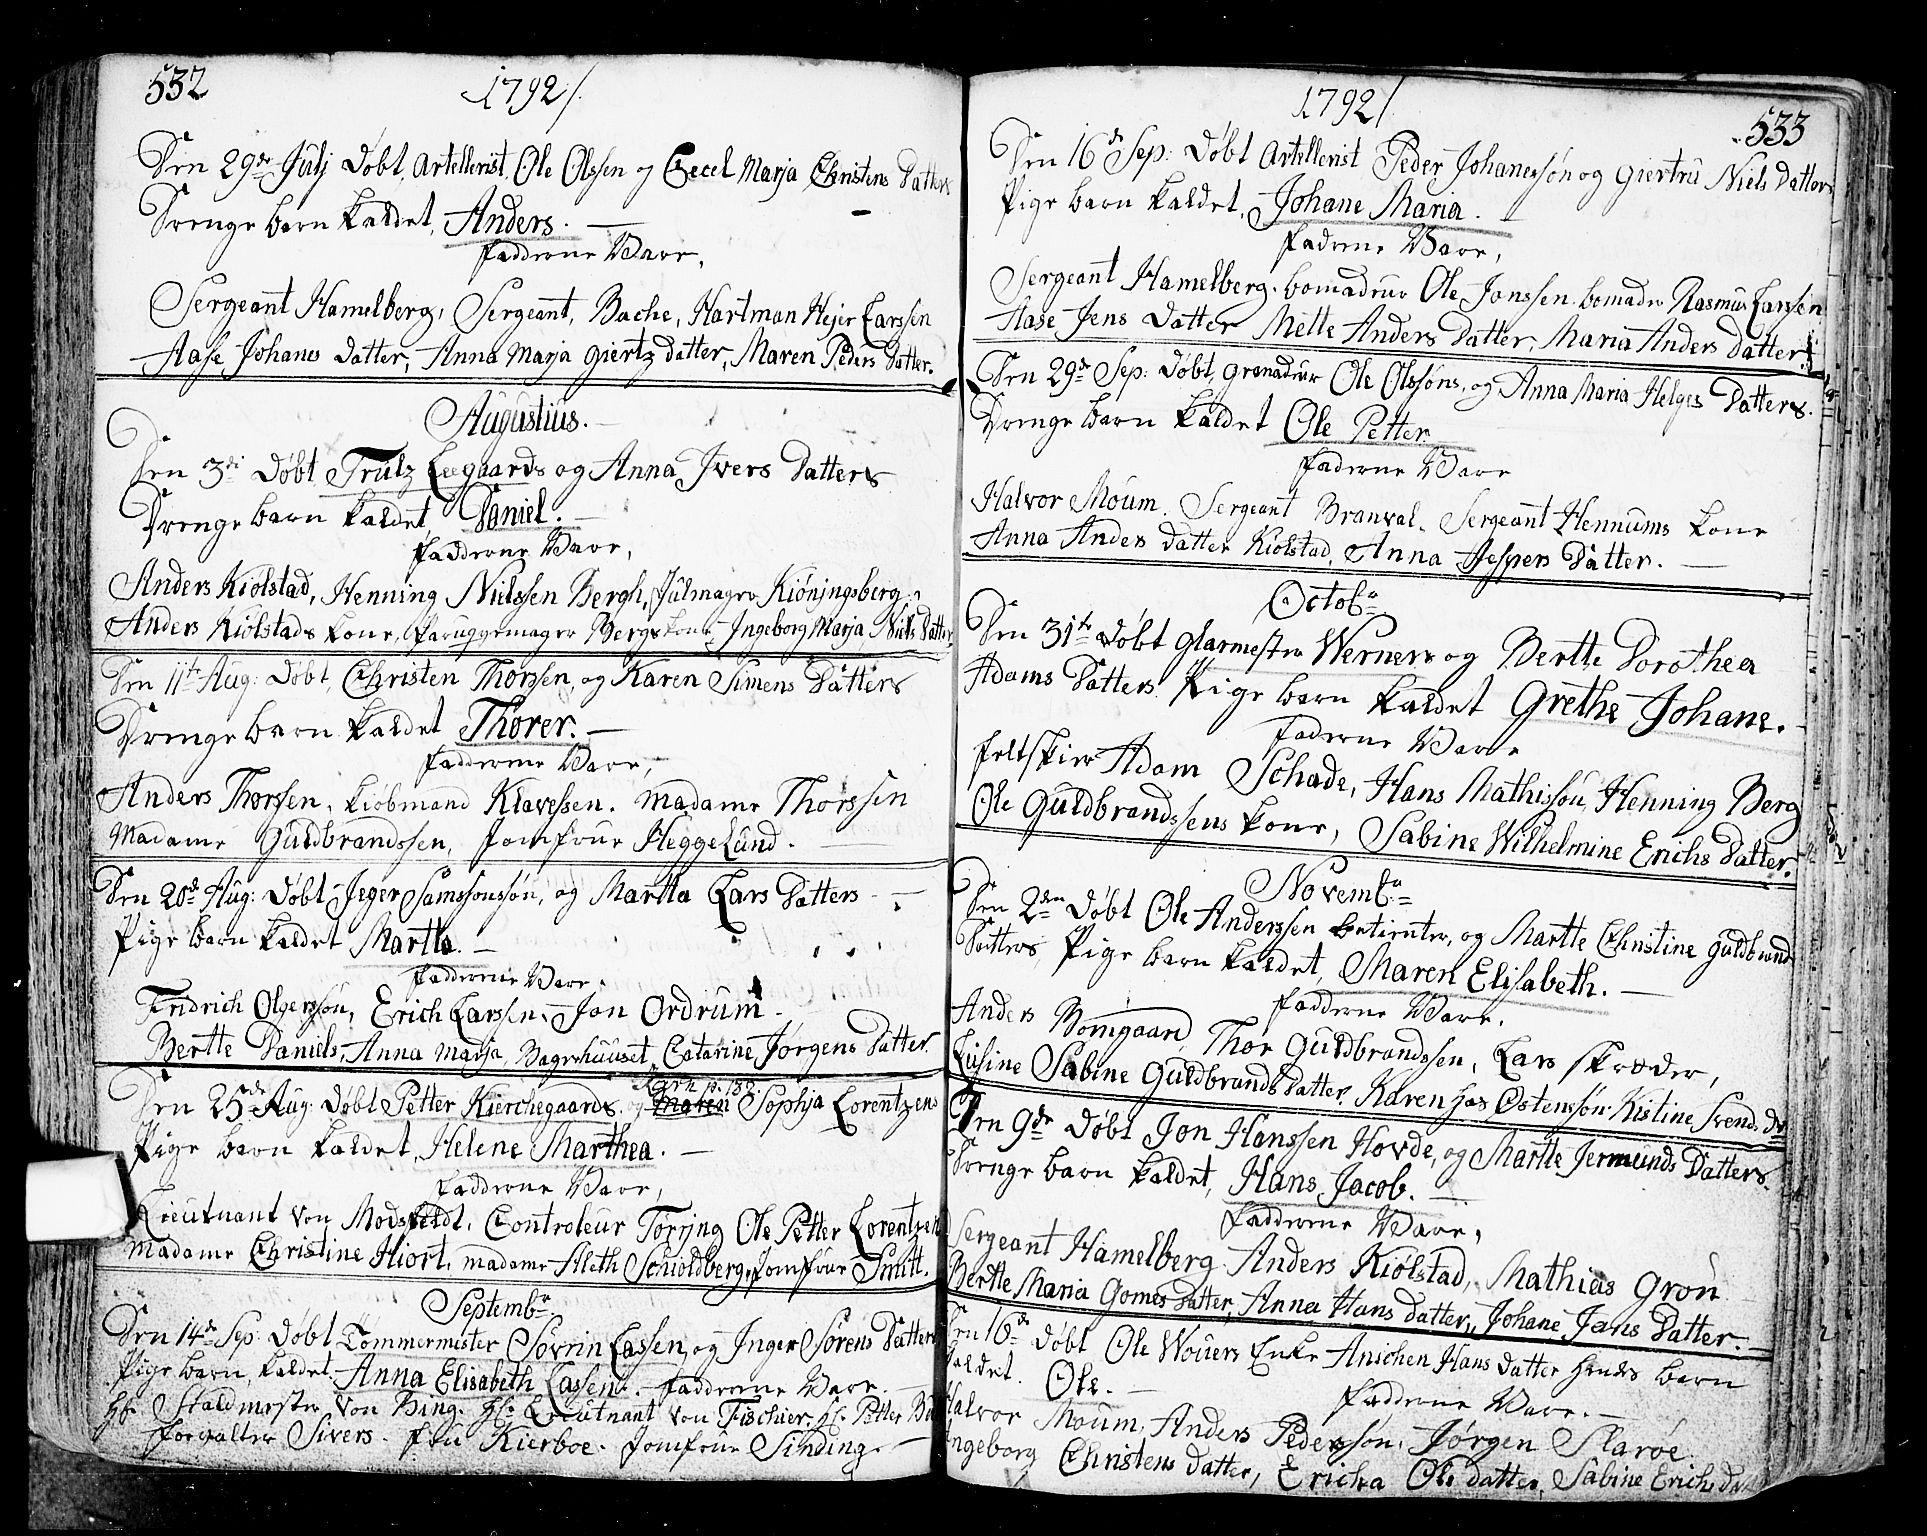 SAO, Fredrikstad prestekontor Kirkebøker, F/Fa/L0002: Ministerialbok nr. 2, 1750-1804, s. 532-533